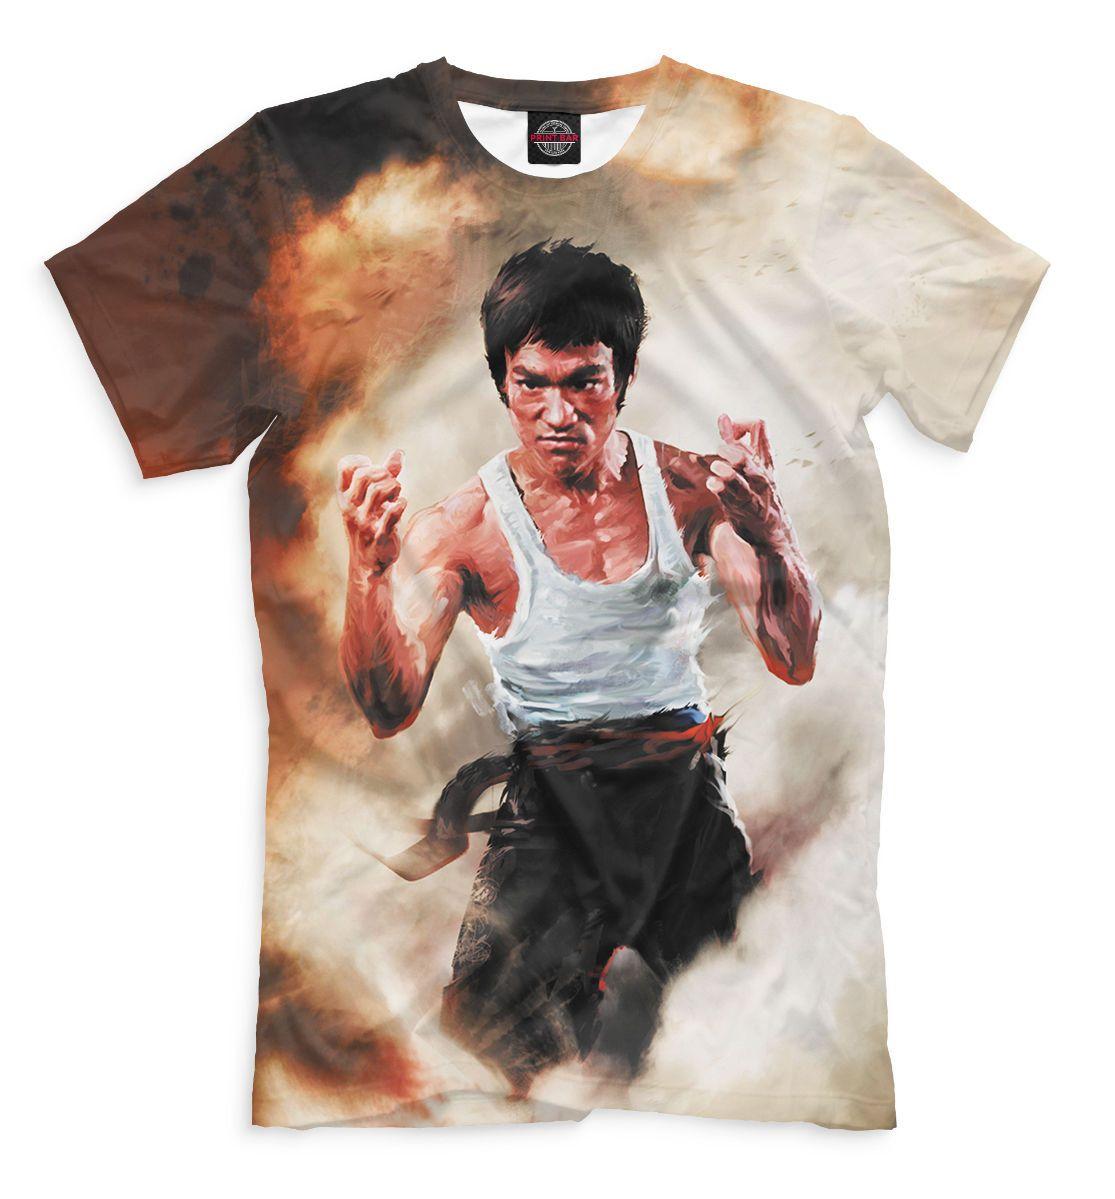 4e0df4a6b Bruce Lee T-Shirt - Legendary Fighter Jun-Fan Tee Sport Karate Kung Fu  Ju-Jitsu